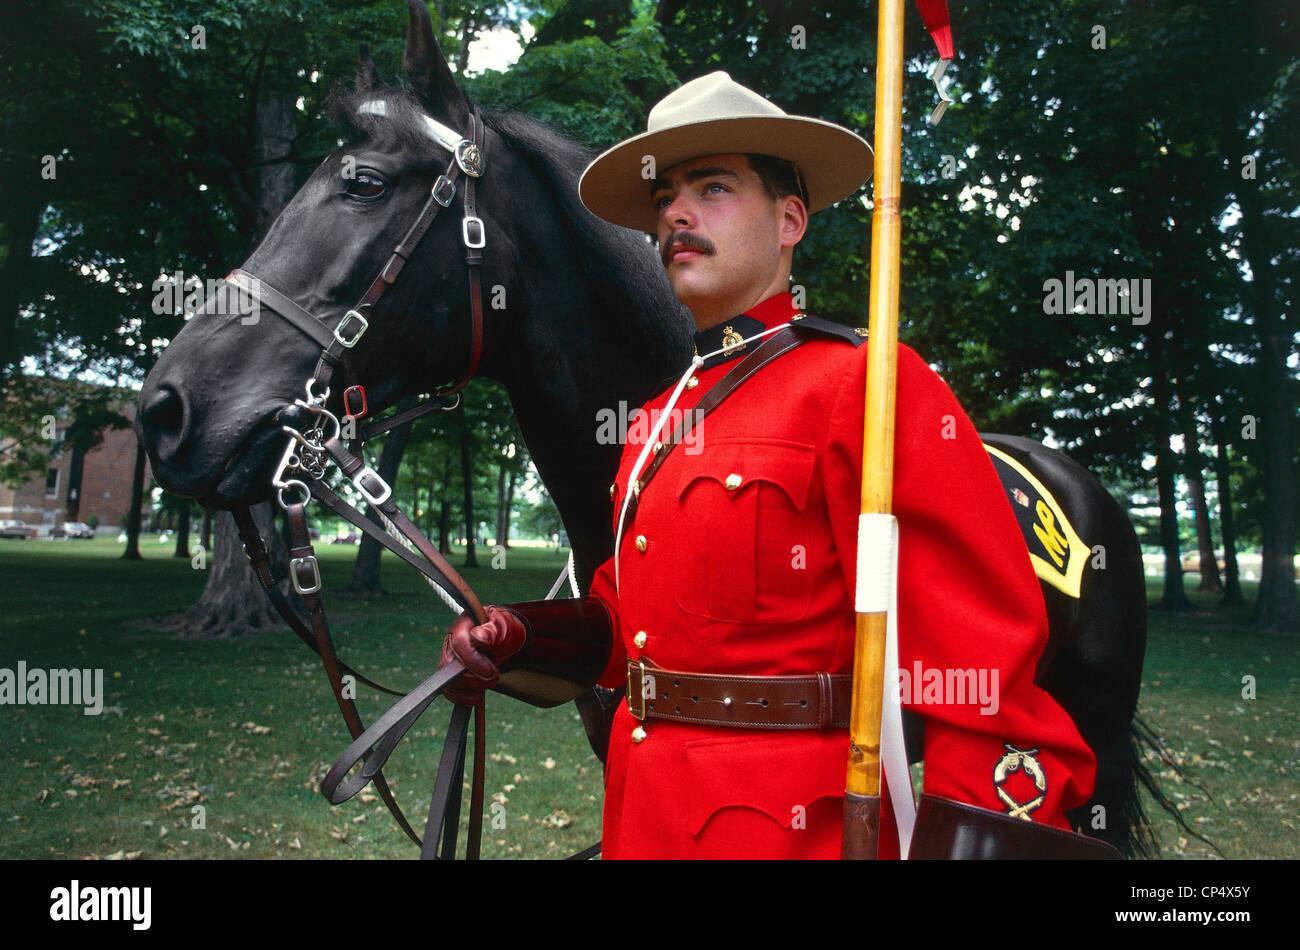 Canada Ontario Ottawa Police Canadian Mounties Or Regia